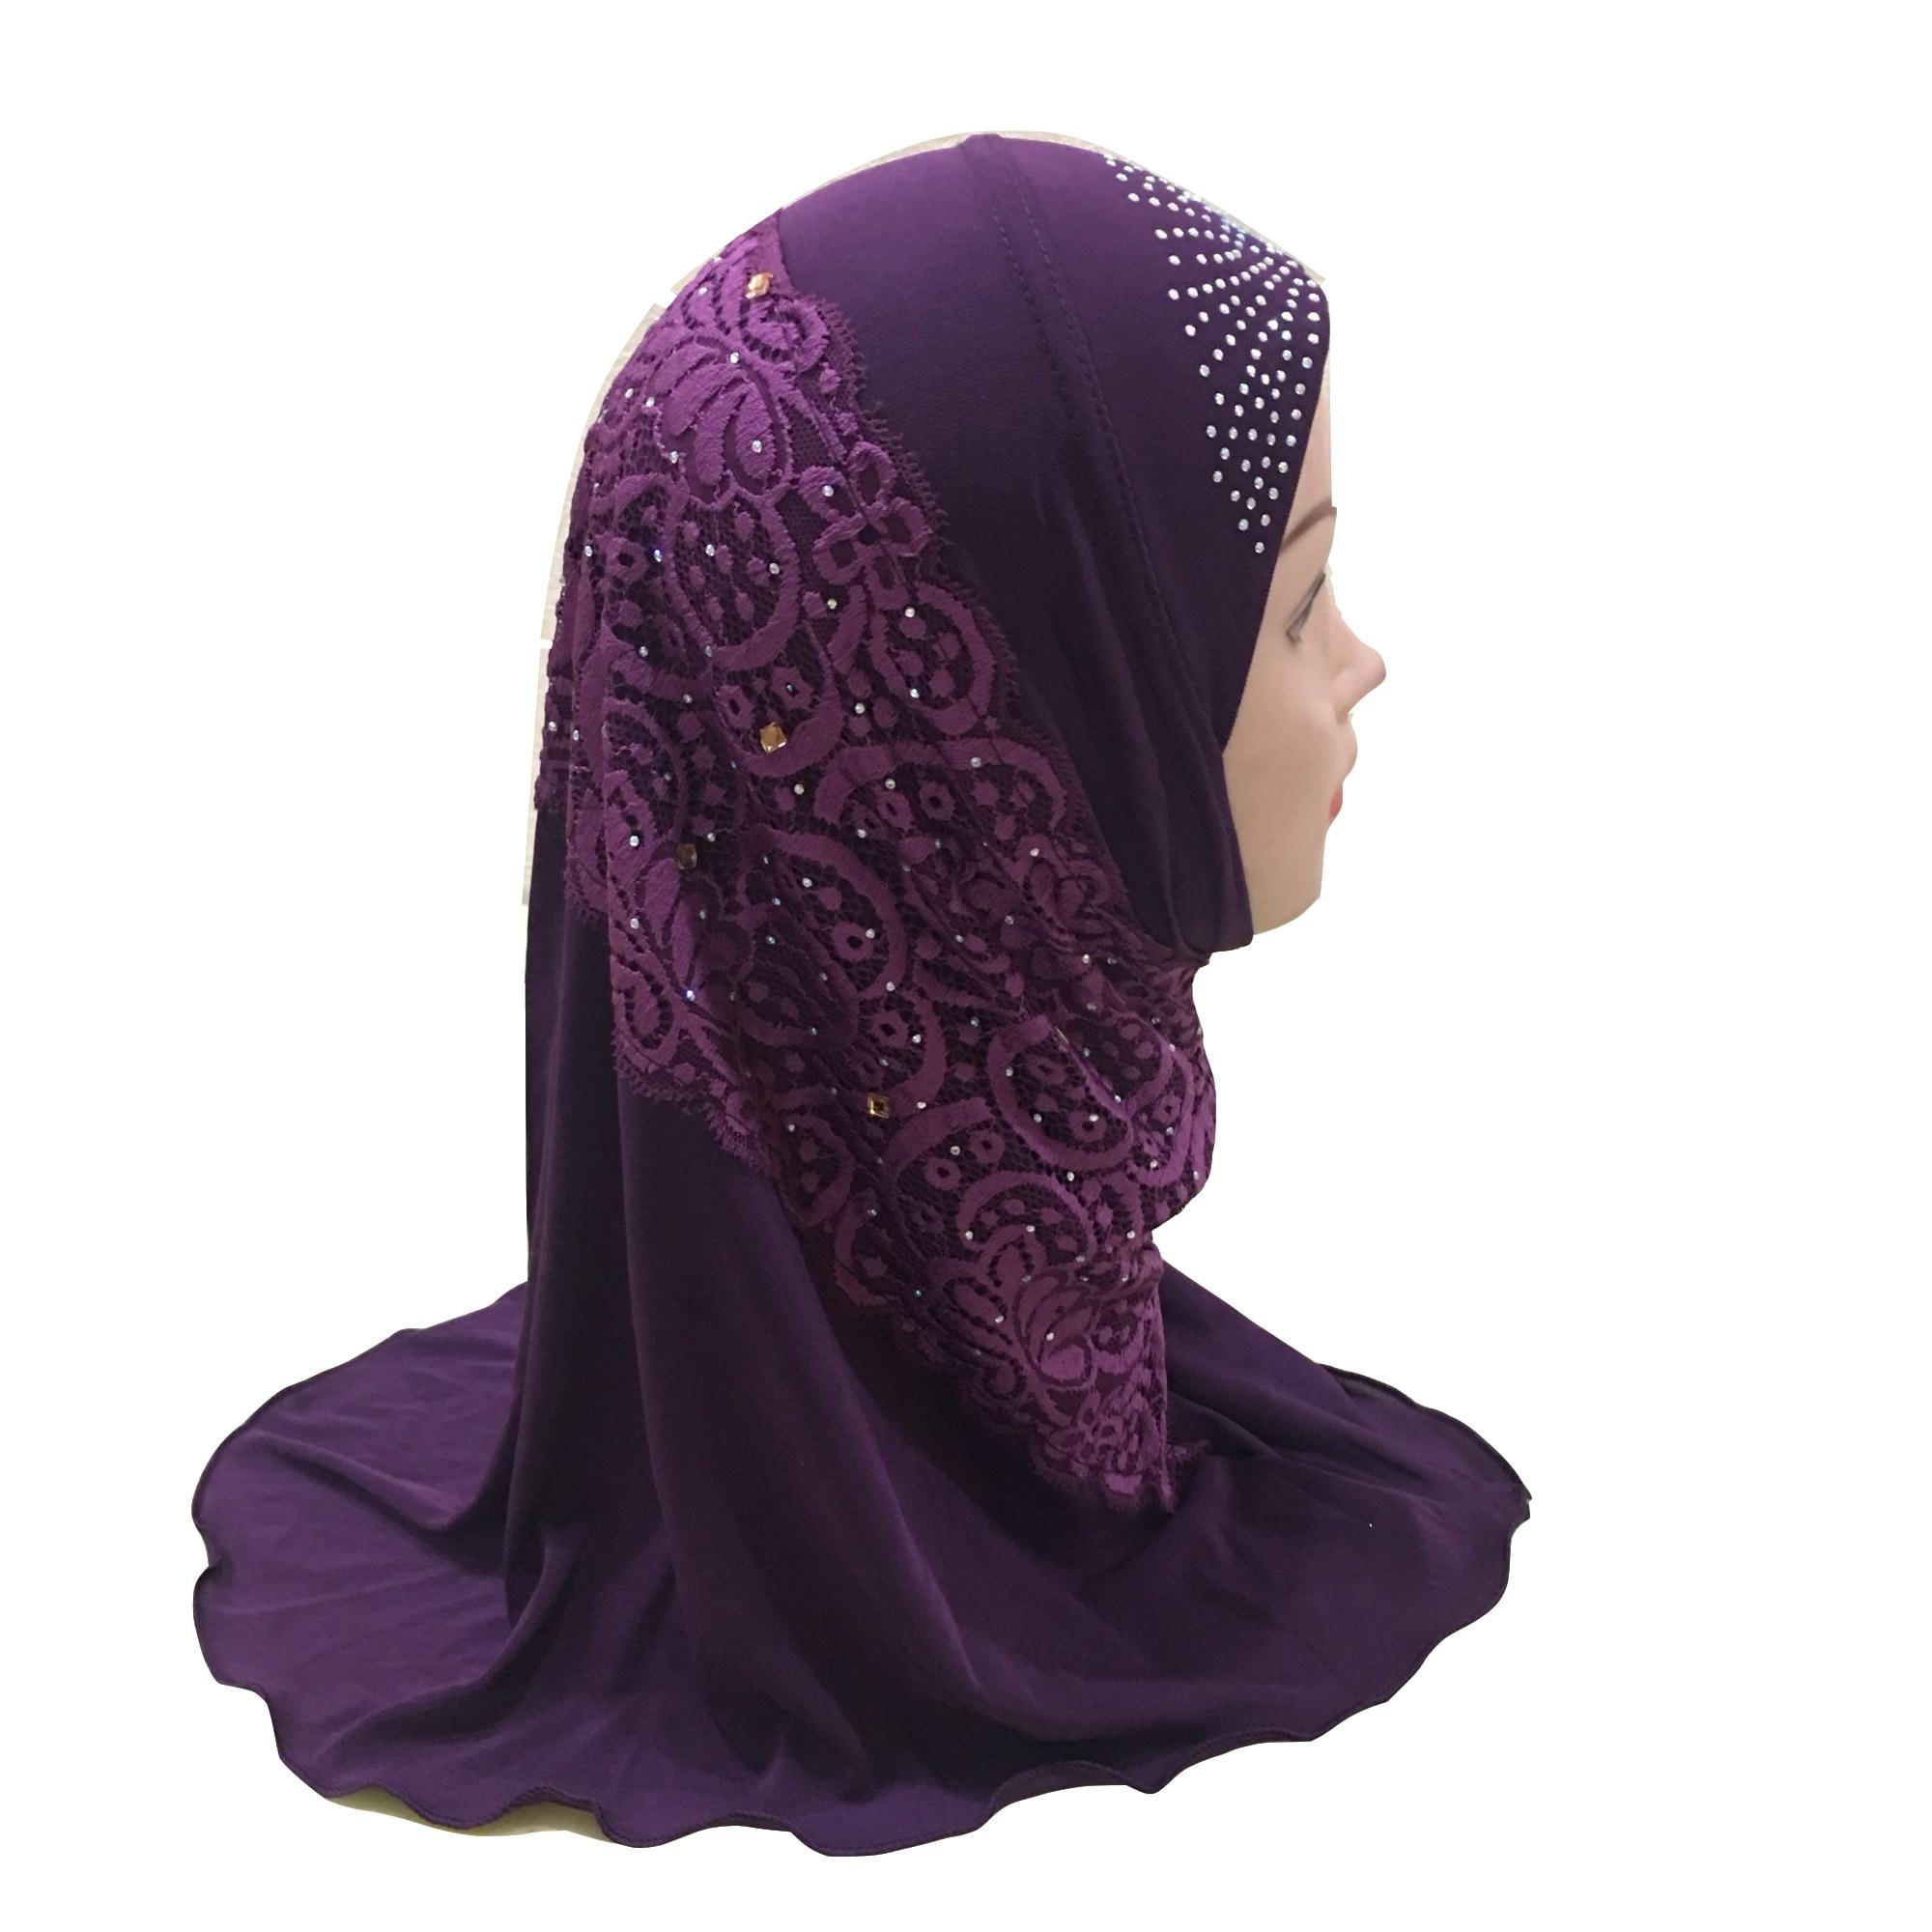 Muslim Girls Hijab Kids Hijab Islamic Fashion Scarf Shawls with  Beautiful Lace Diamond WholesaleIslamic Clothing